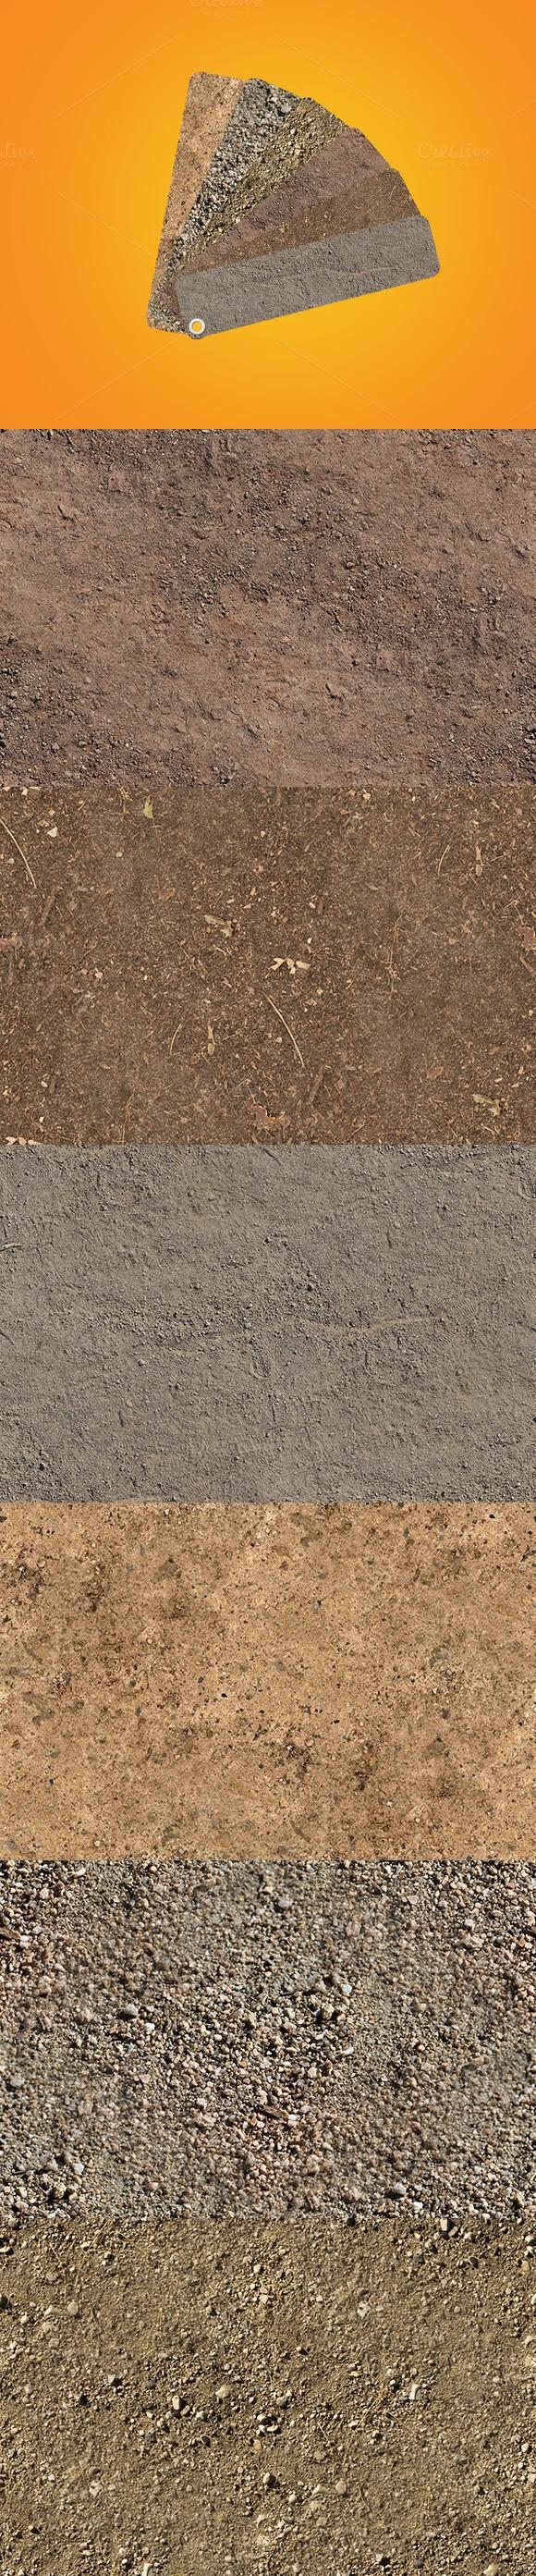 Textures architecture roads roads dirt road texture seamless - 6 Hd Seamless Dirt Textures Dirt Texture